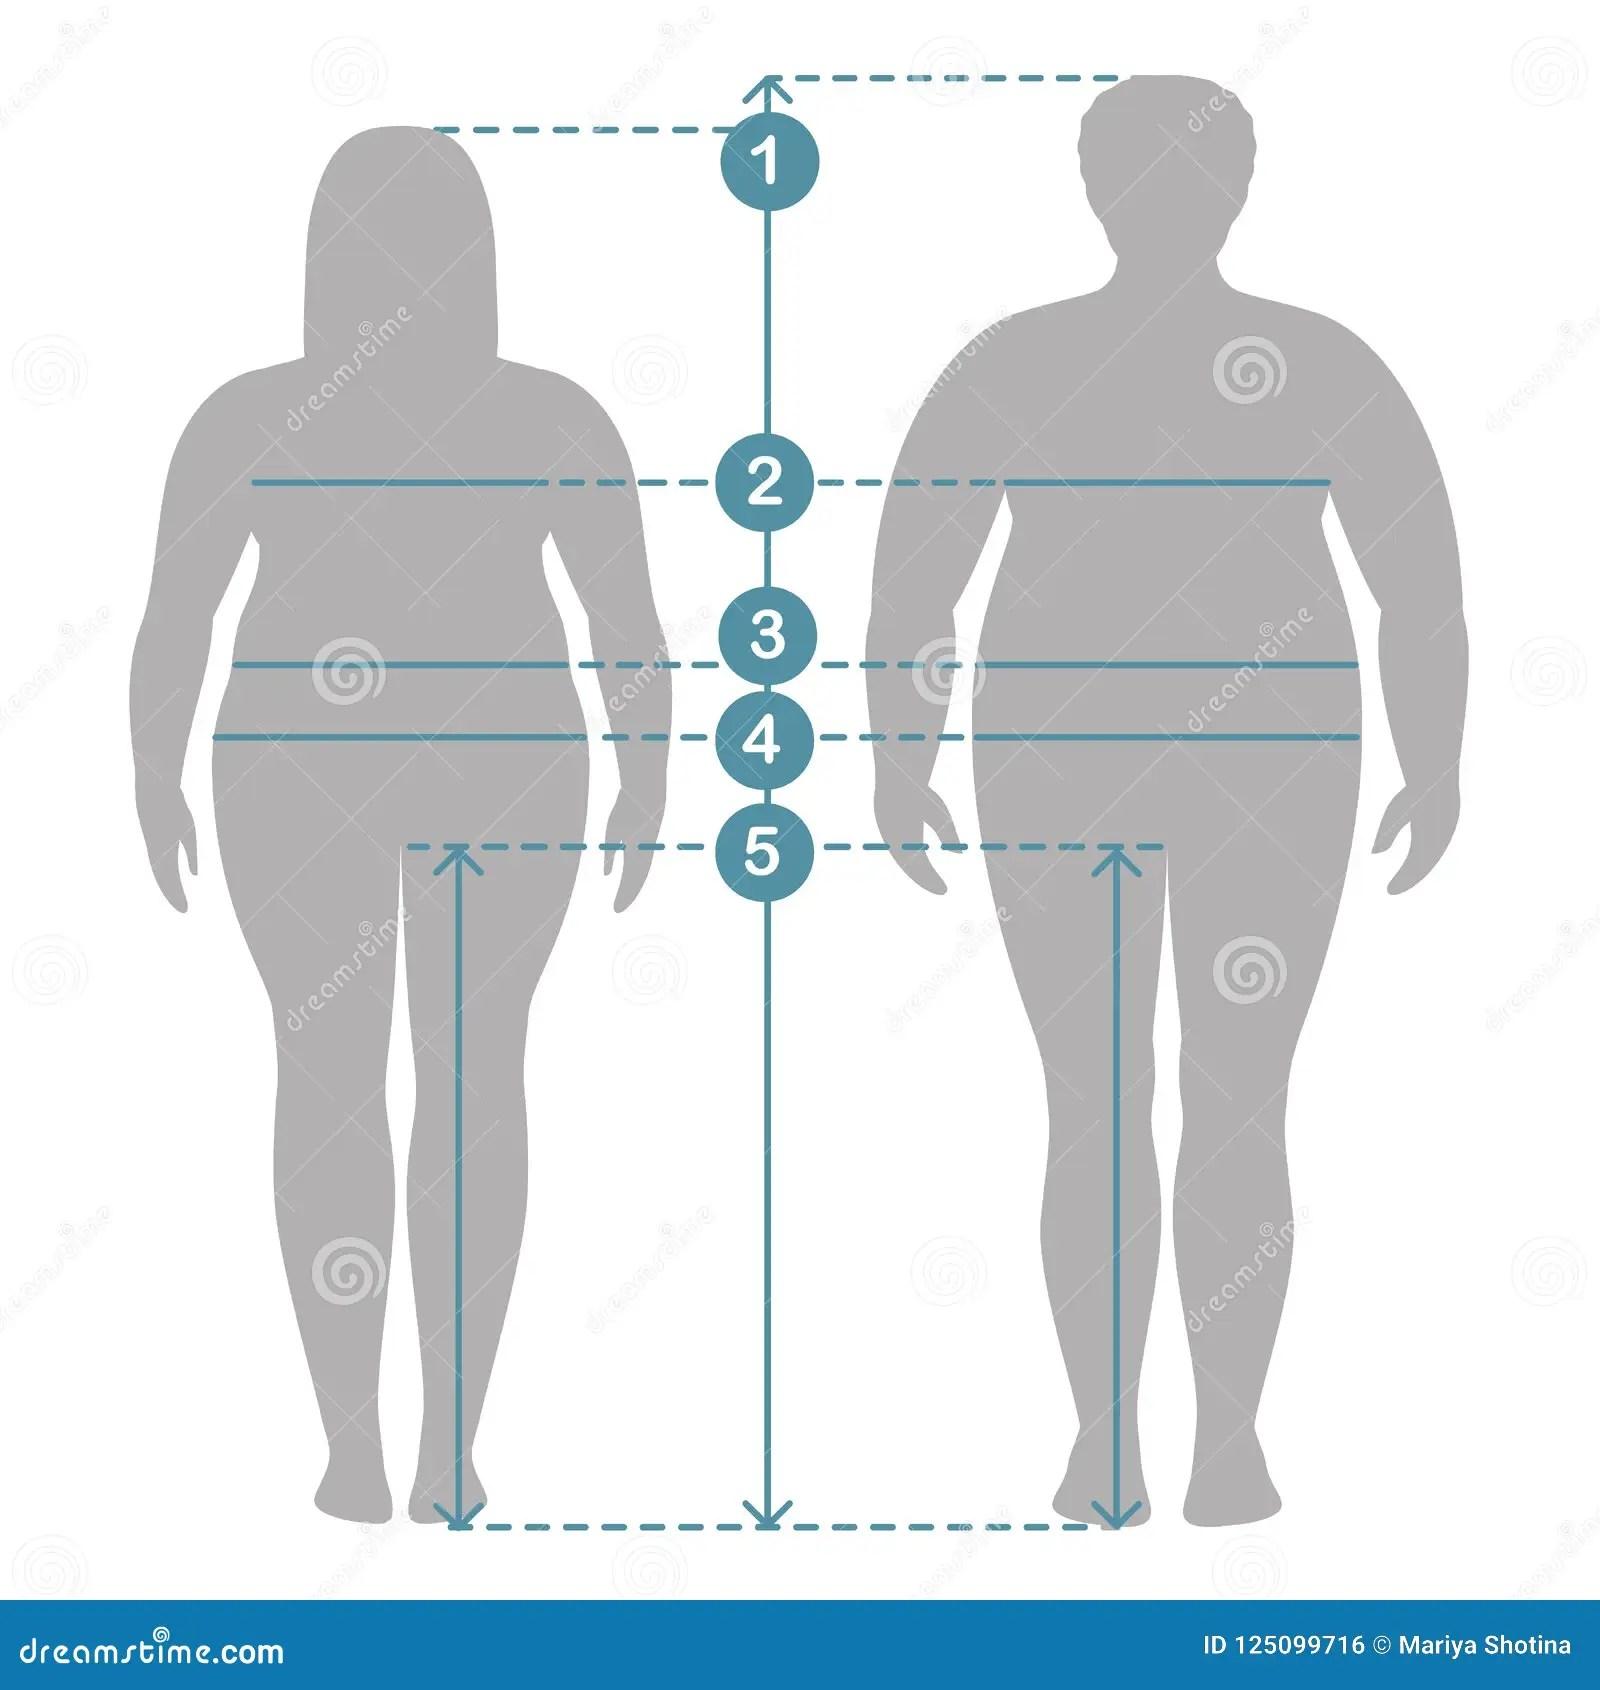 Man And Women Clothes Plus Size Measurements Human Body